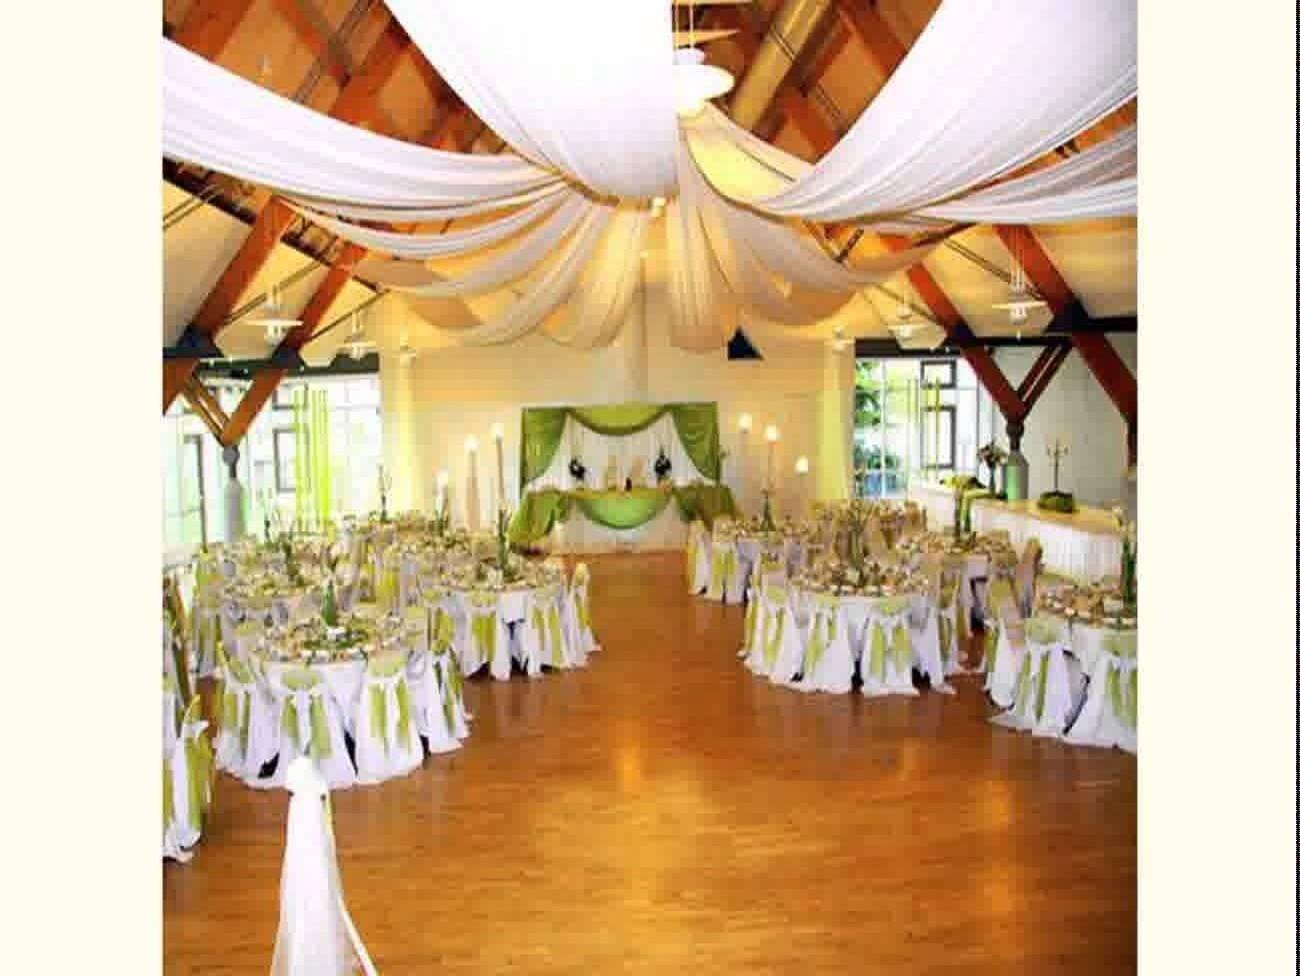 10 Stunning 50 Wedding Anniversary Party Ideas 50th wedding anniversary decoration ideas 2015 youtube 1 2021